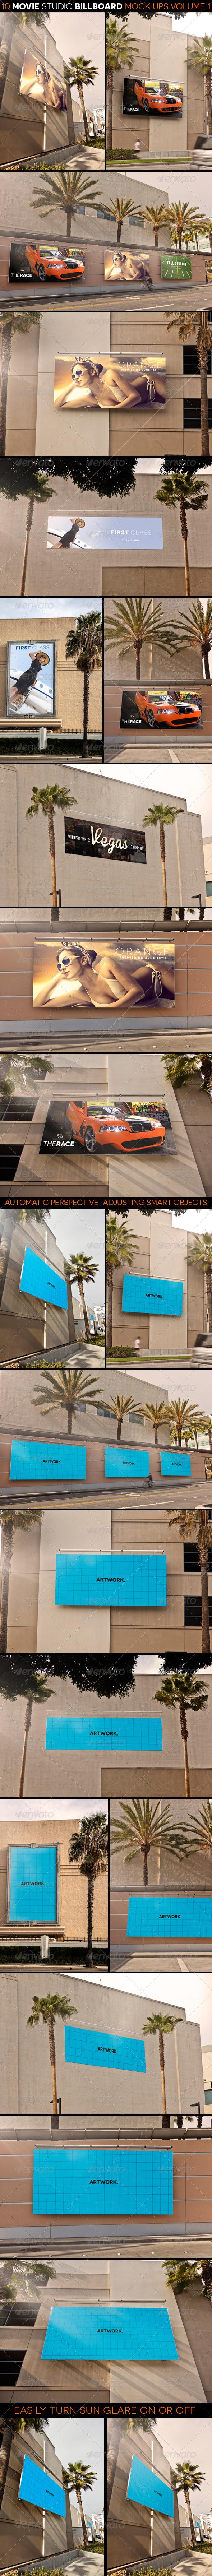 Movie Studio Billboard Mock Ups Volume 1 - Signage Print